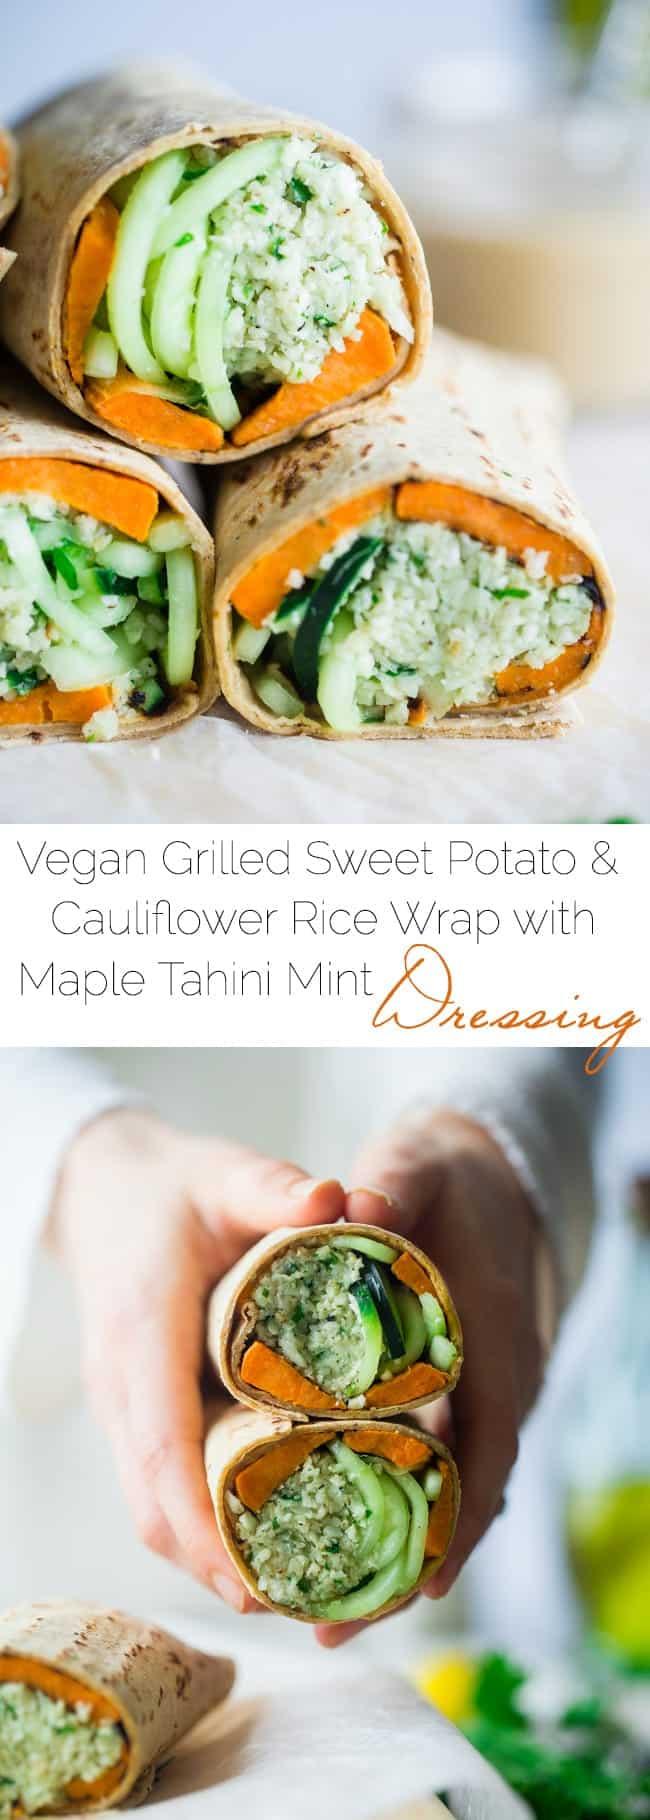 Vegan Grilled Sweet Potato and Mint Tahini Cauliflower Rice Wraps - Grilled sweet potatoes, mint tahini cauliflower rice and spiralized cucumber noodles make this easy, healthy and portable meatless meal! | Foodfaithfitness.com | @FoodFaithFit